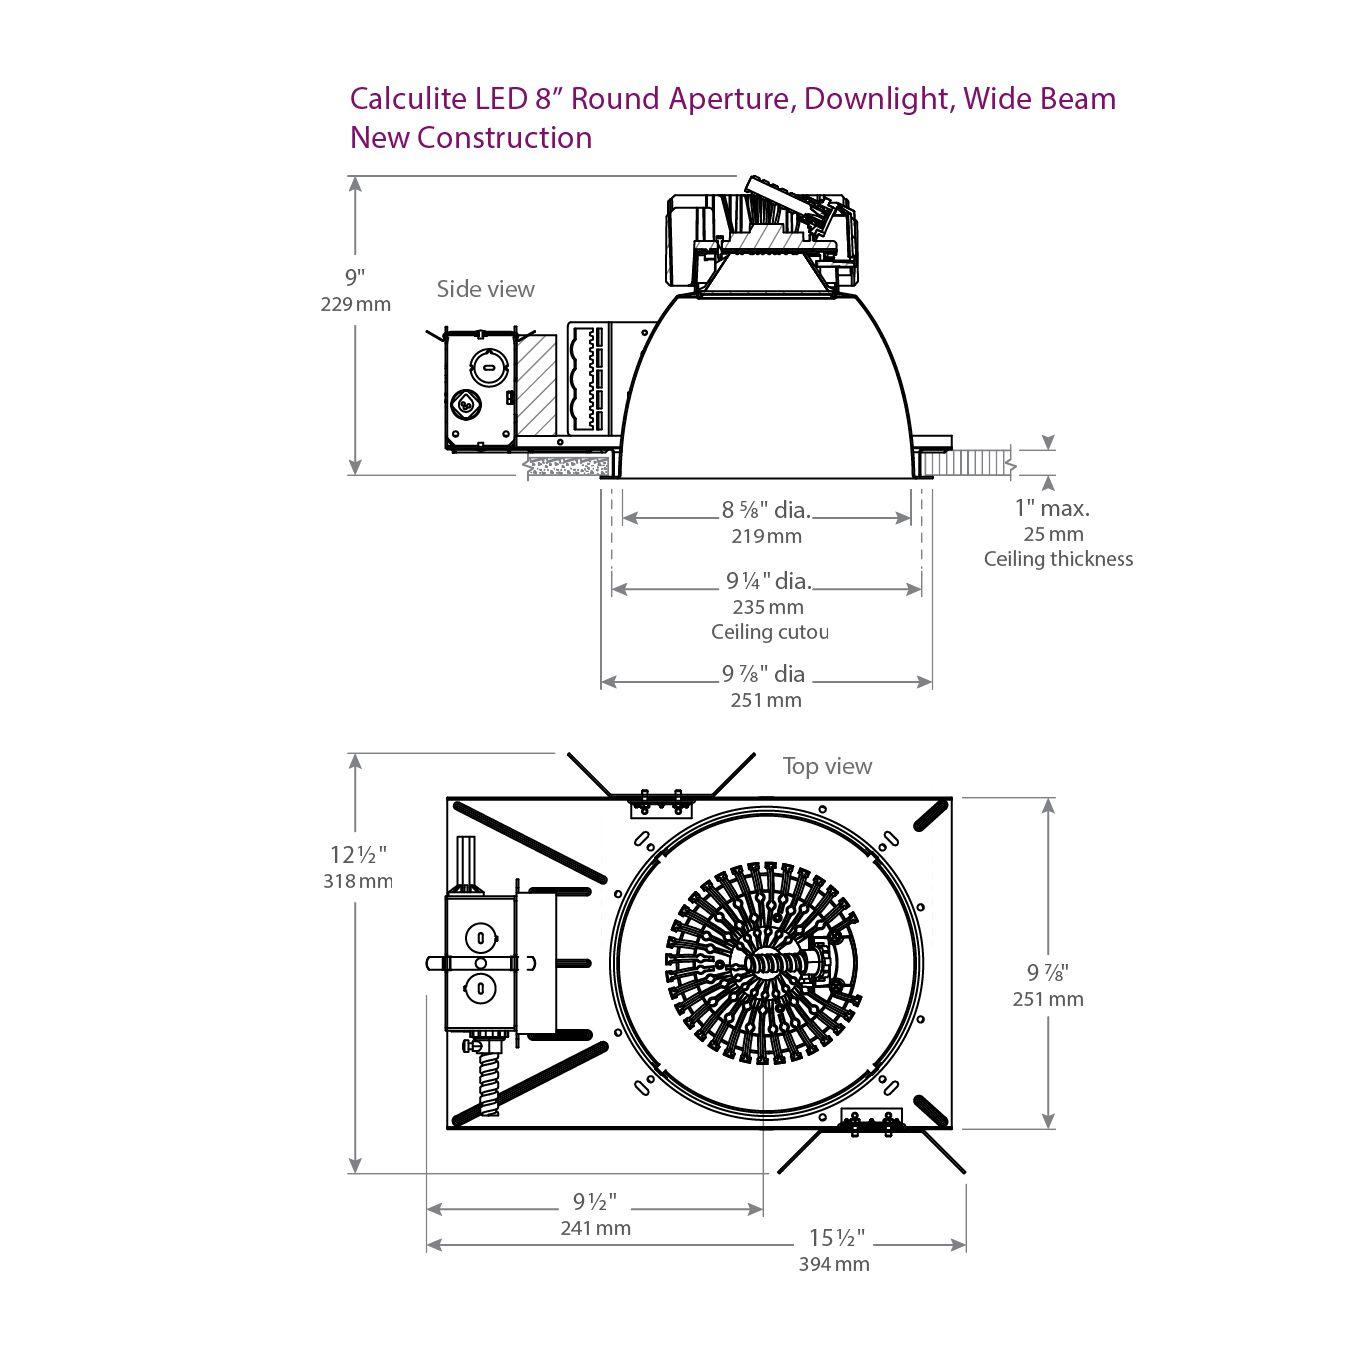 Lightolier C8l35n Calculite Led 8 Round Aperture Wide